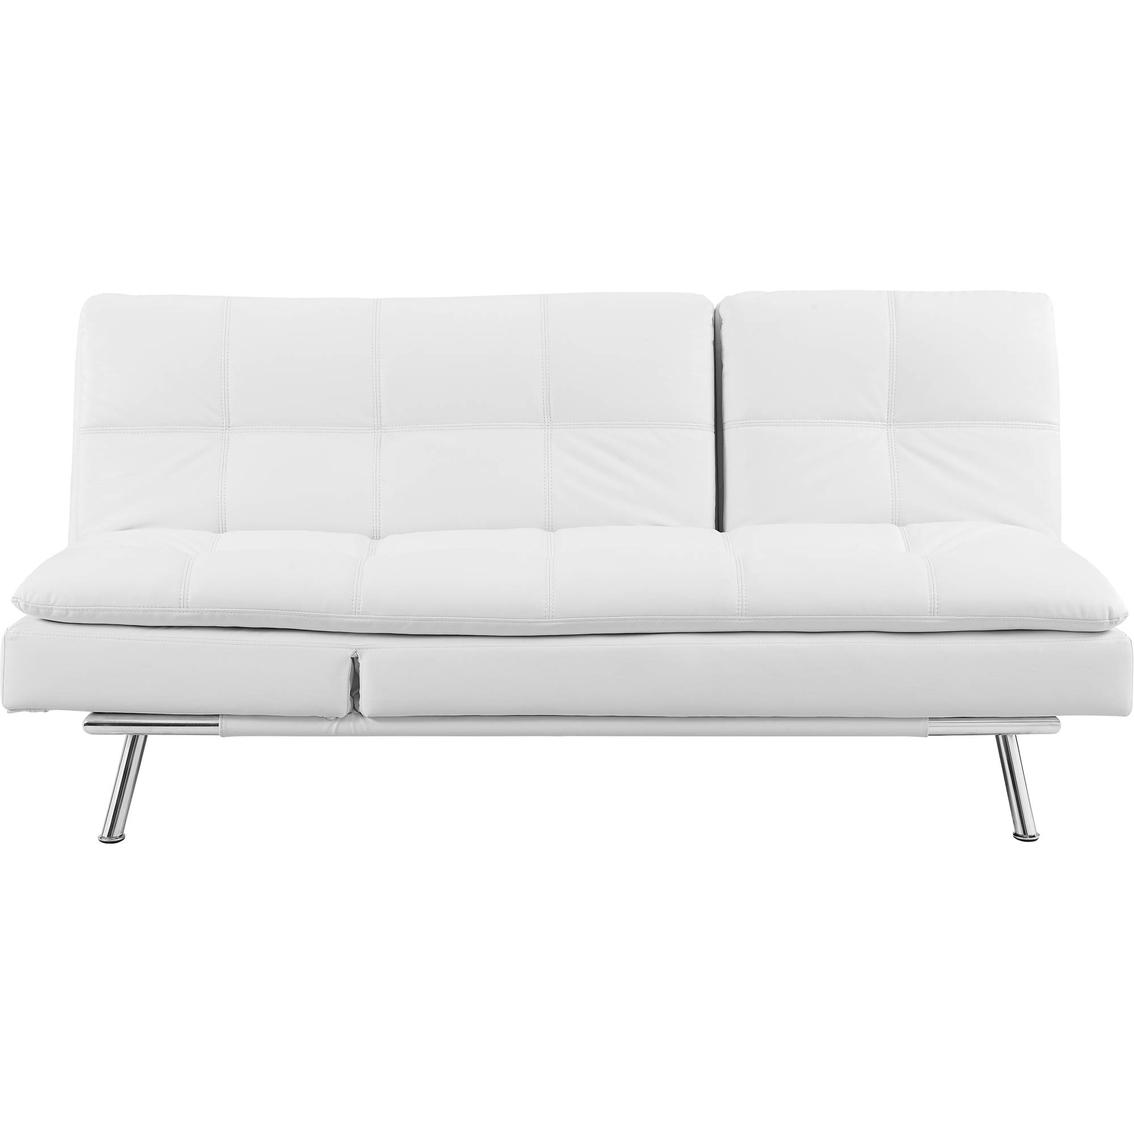 Pleasing Serta Palermo Convertible White Leather Sleeper Chaise Sofa Download Free Architecture Designs Scobabritishbridgeorg